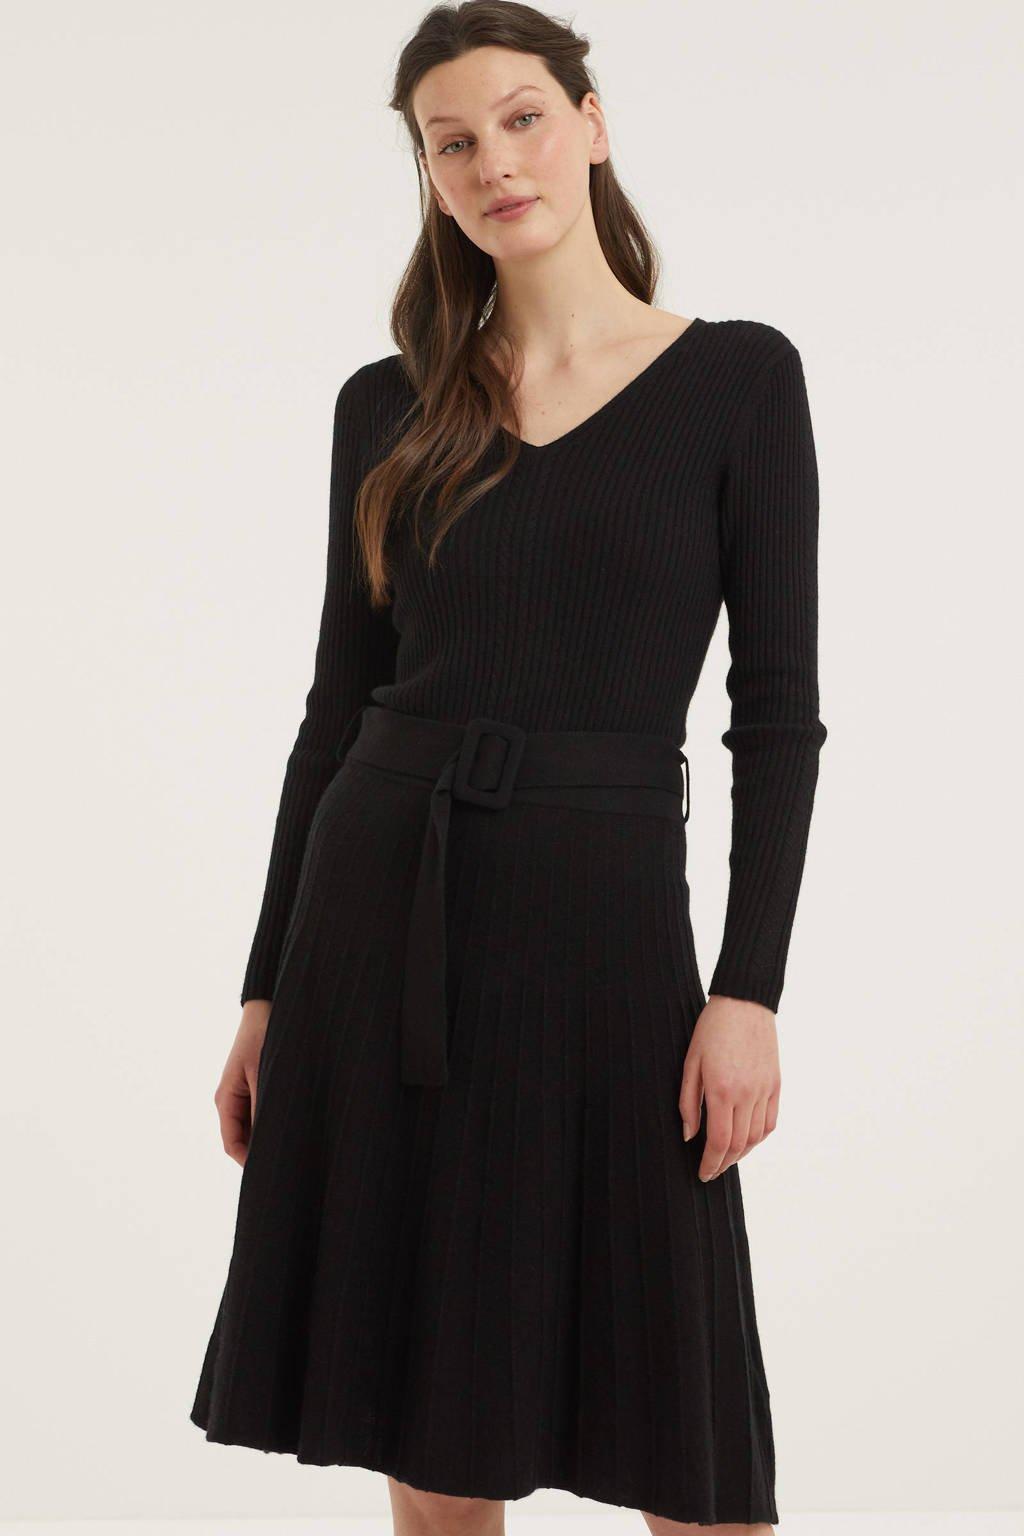 C&A YESSICA PREMIUM gebreide A-lijn jurk met ceintuur zwart, Zwart